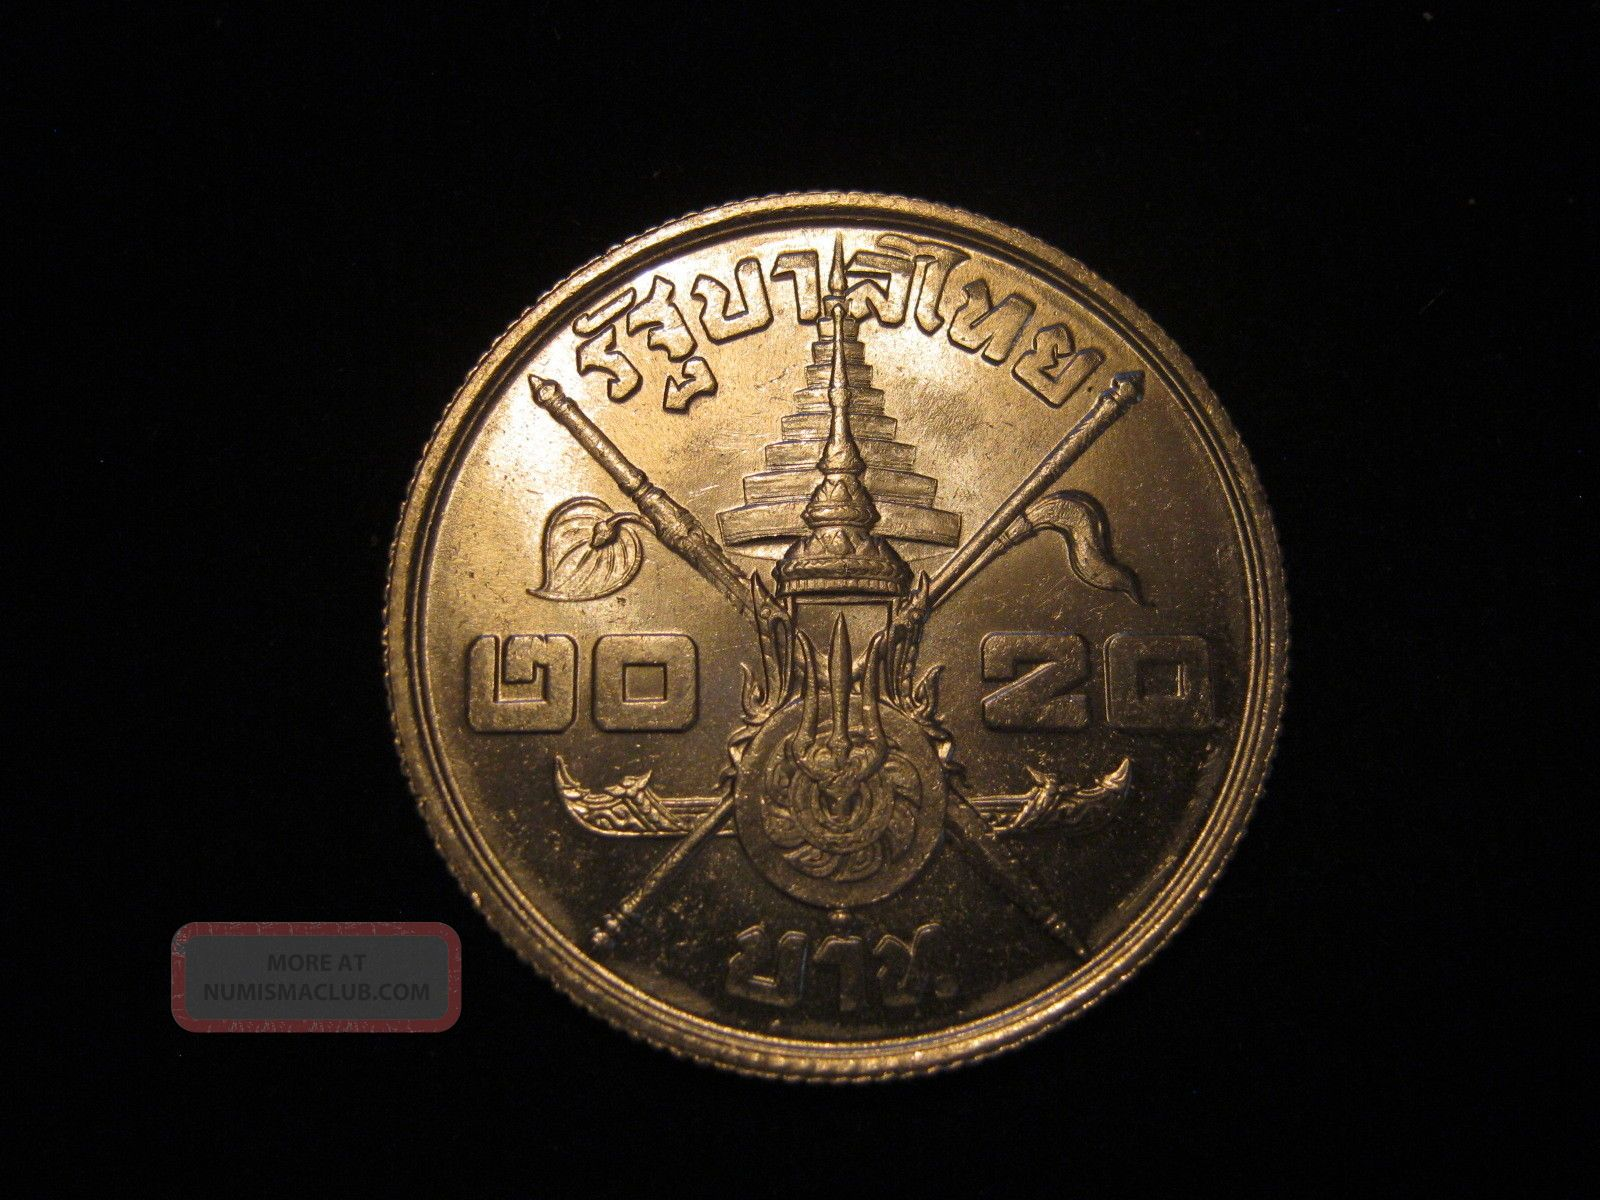 1963 Thailand 20 Baht Silver Coin Uncirculated